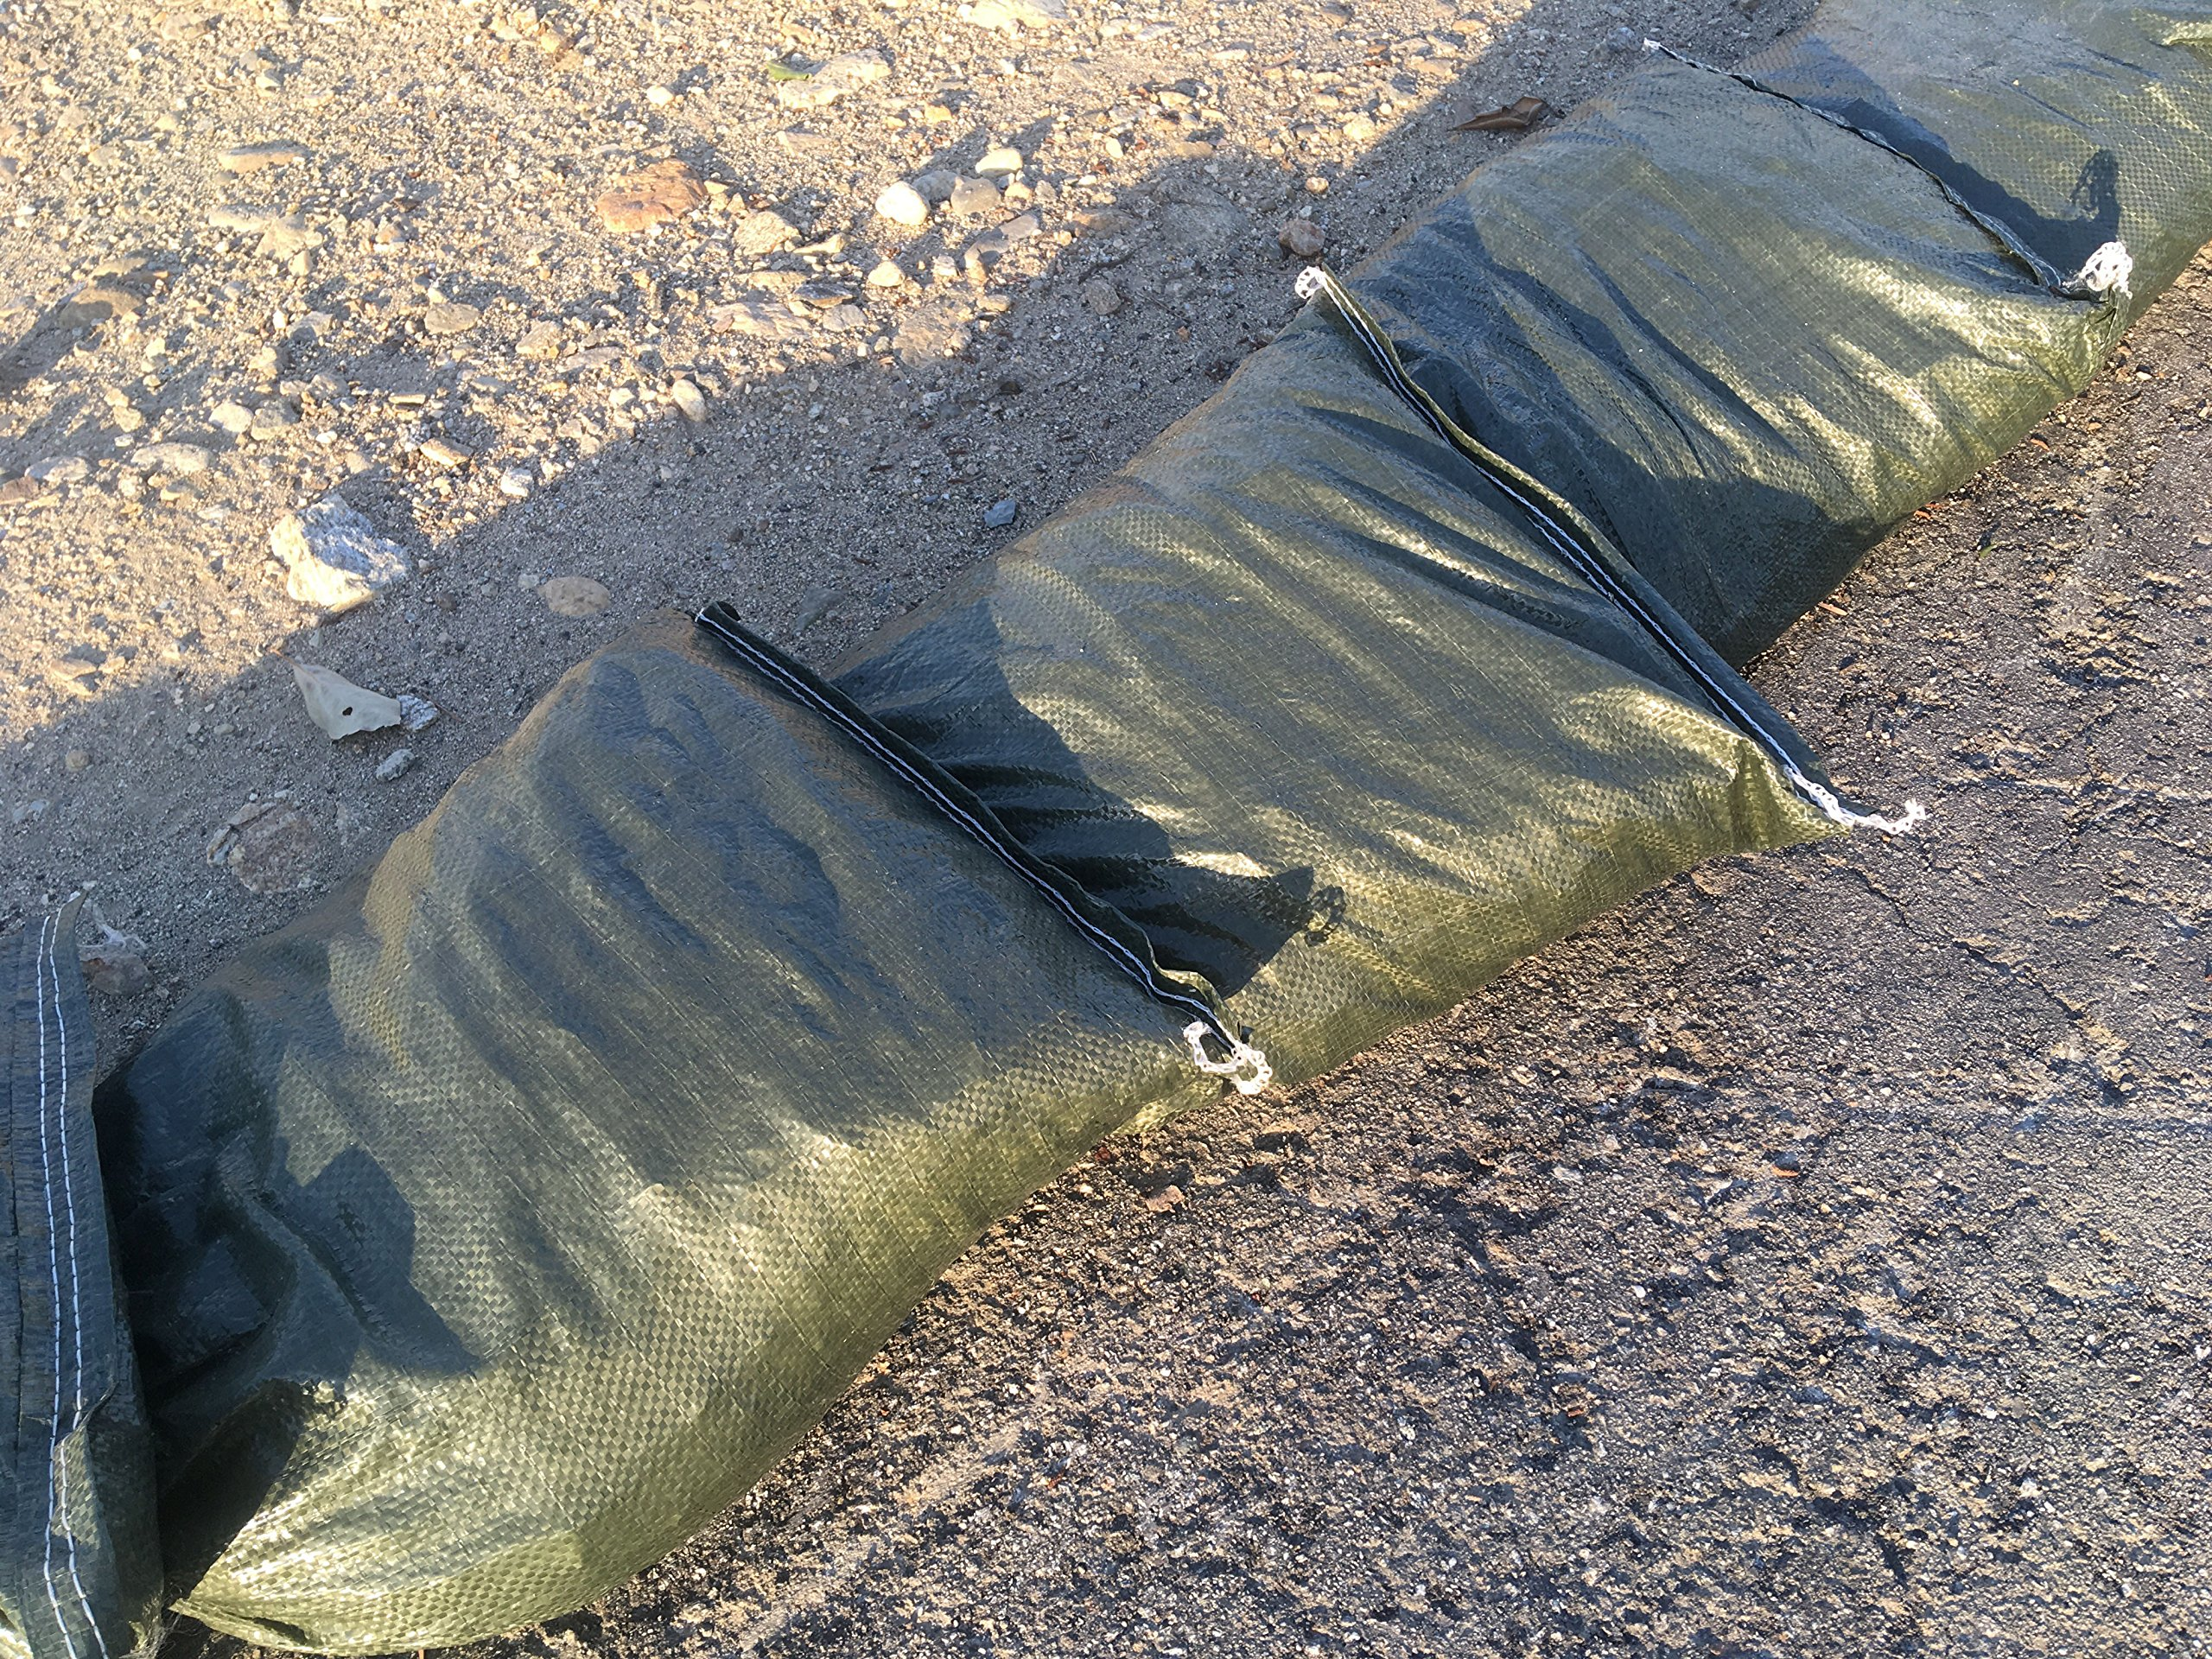 Polypropylene Olive Drab Sandbag - 15 Pieces